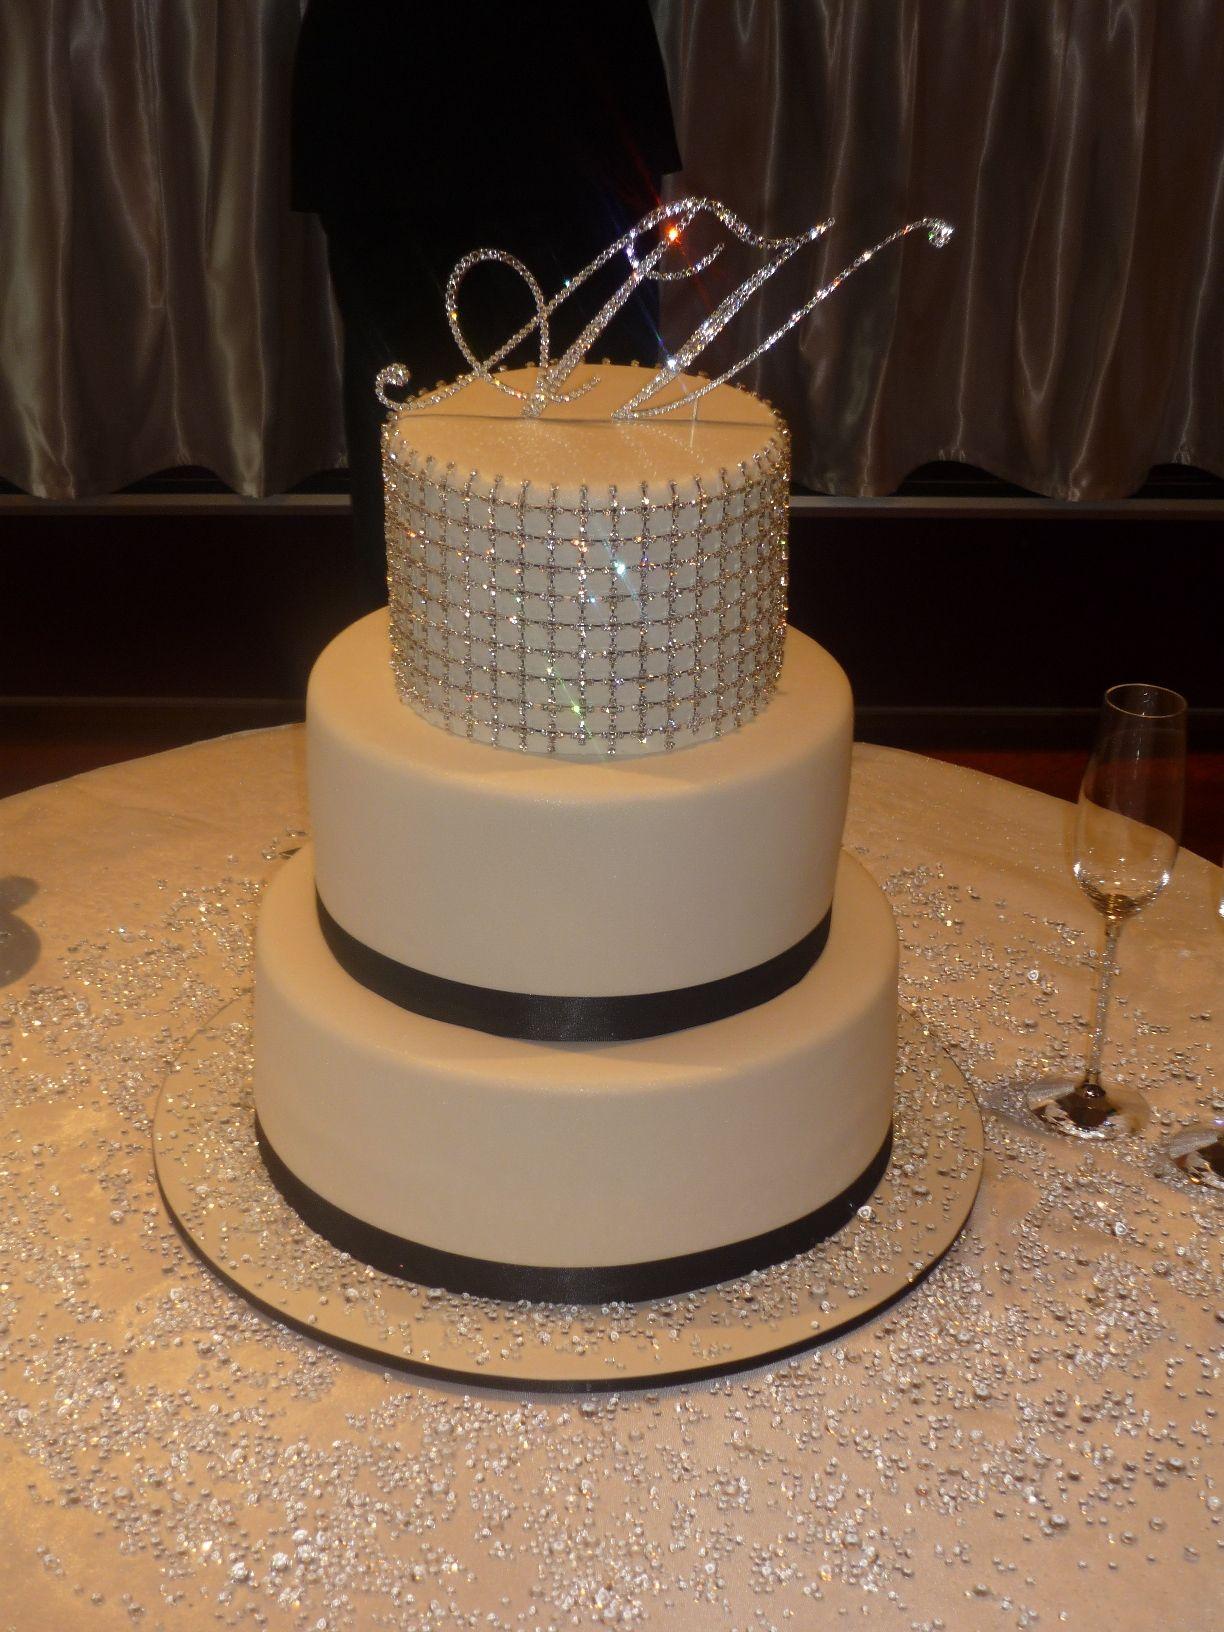 Bling bling wedding cake tiers of chocolate mudcake with ganache